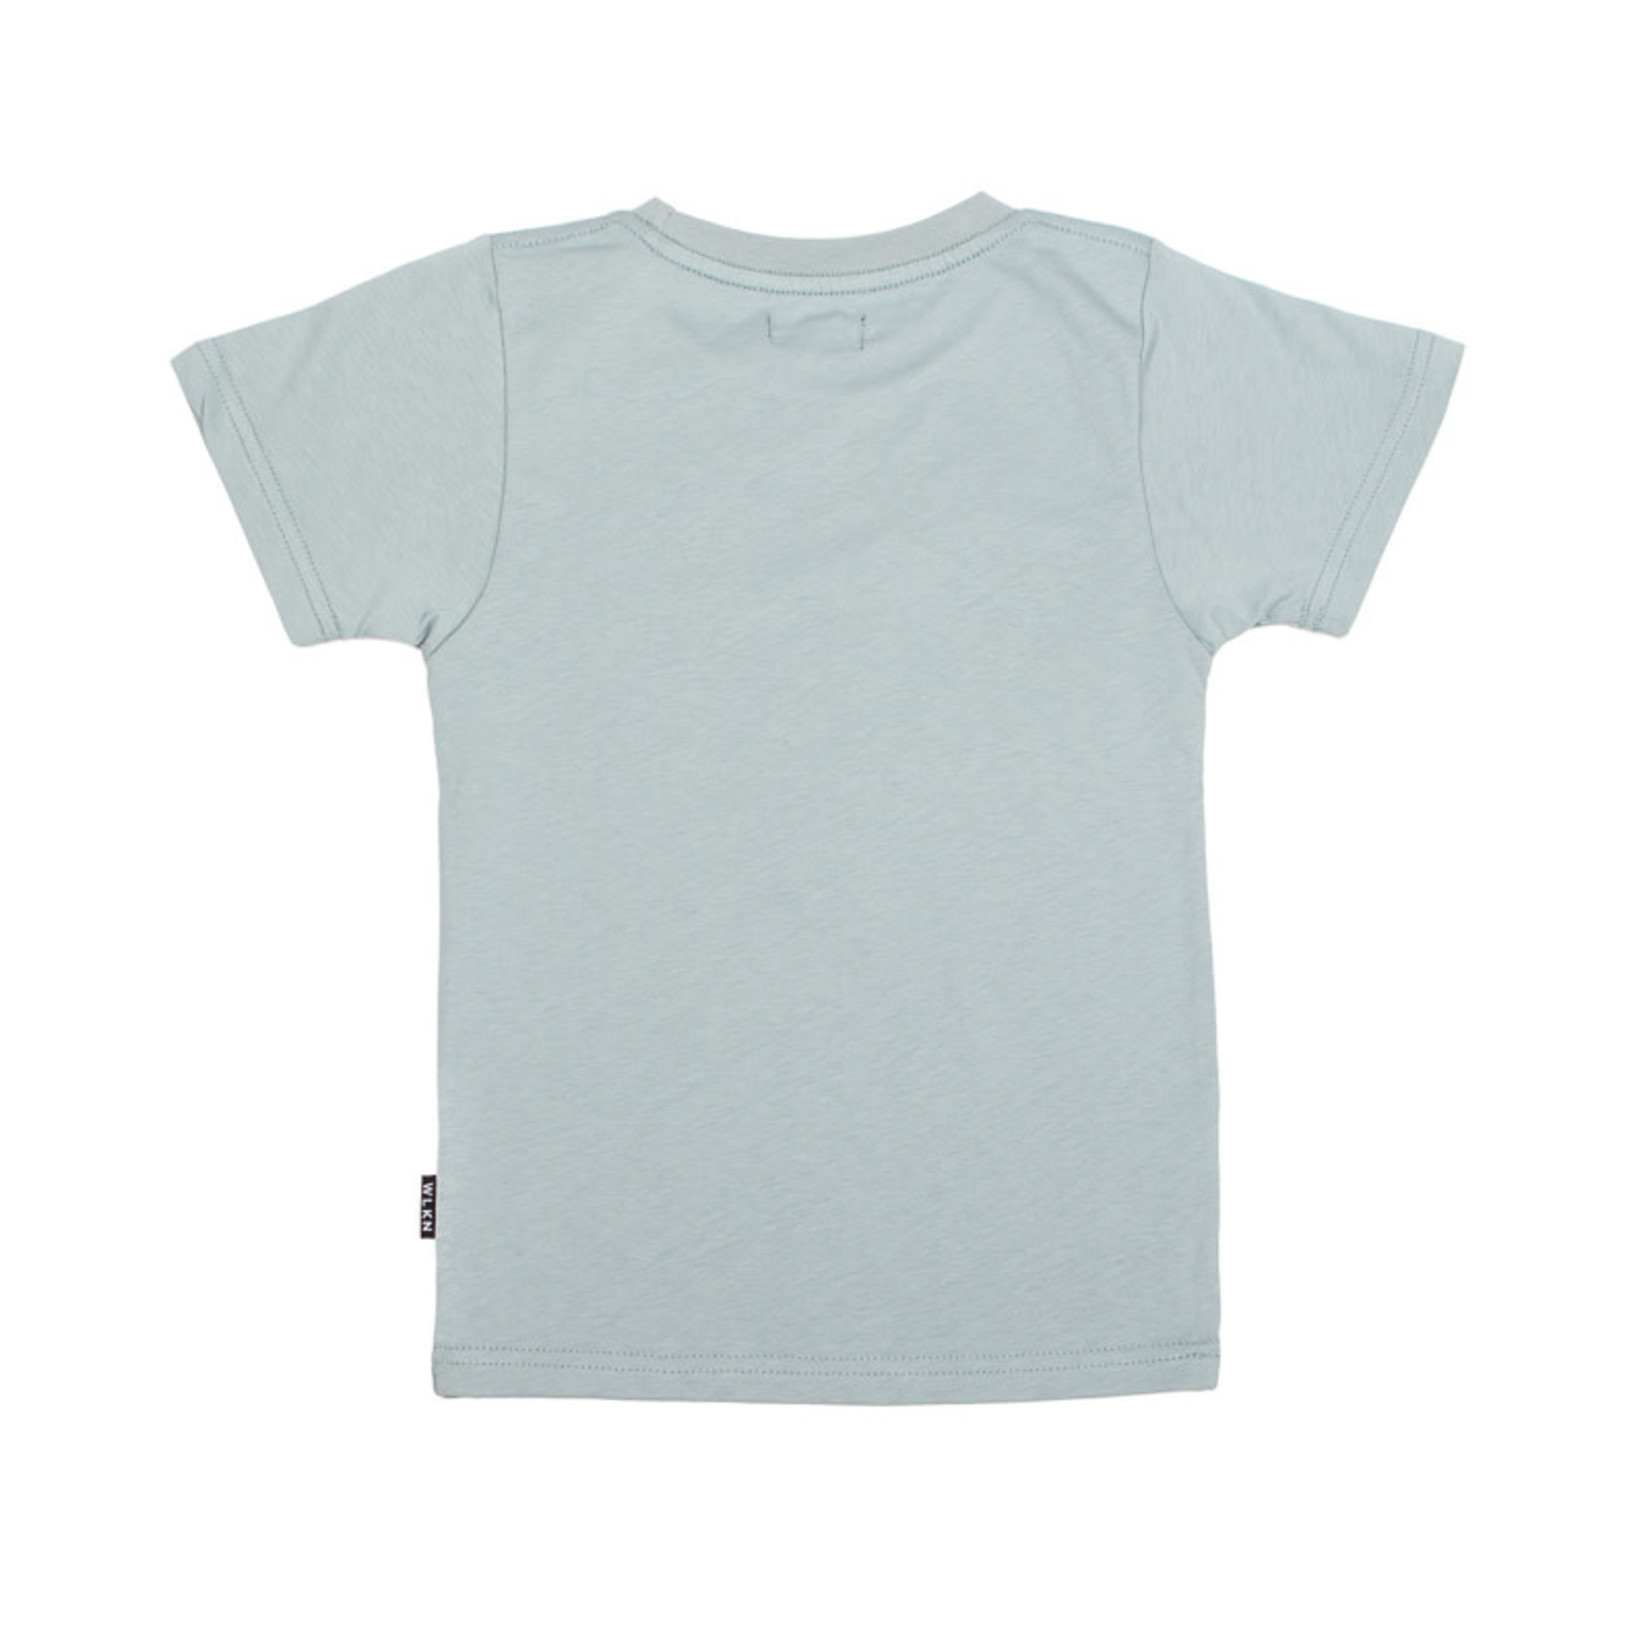 WLKN WLKN : Girl Junior Athletic T-Shirt